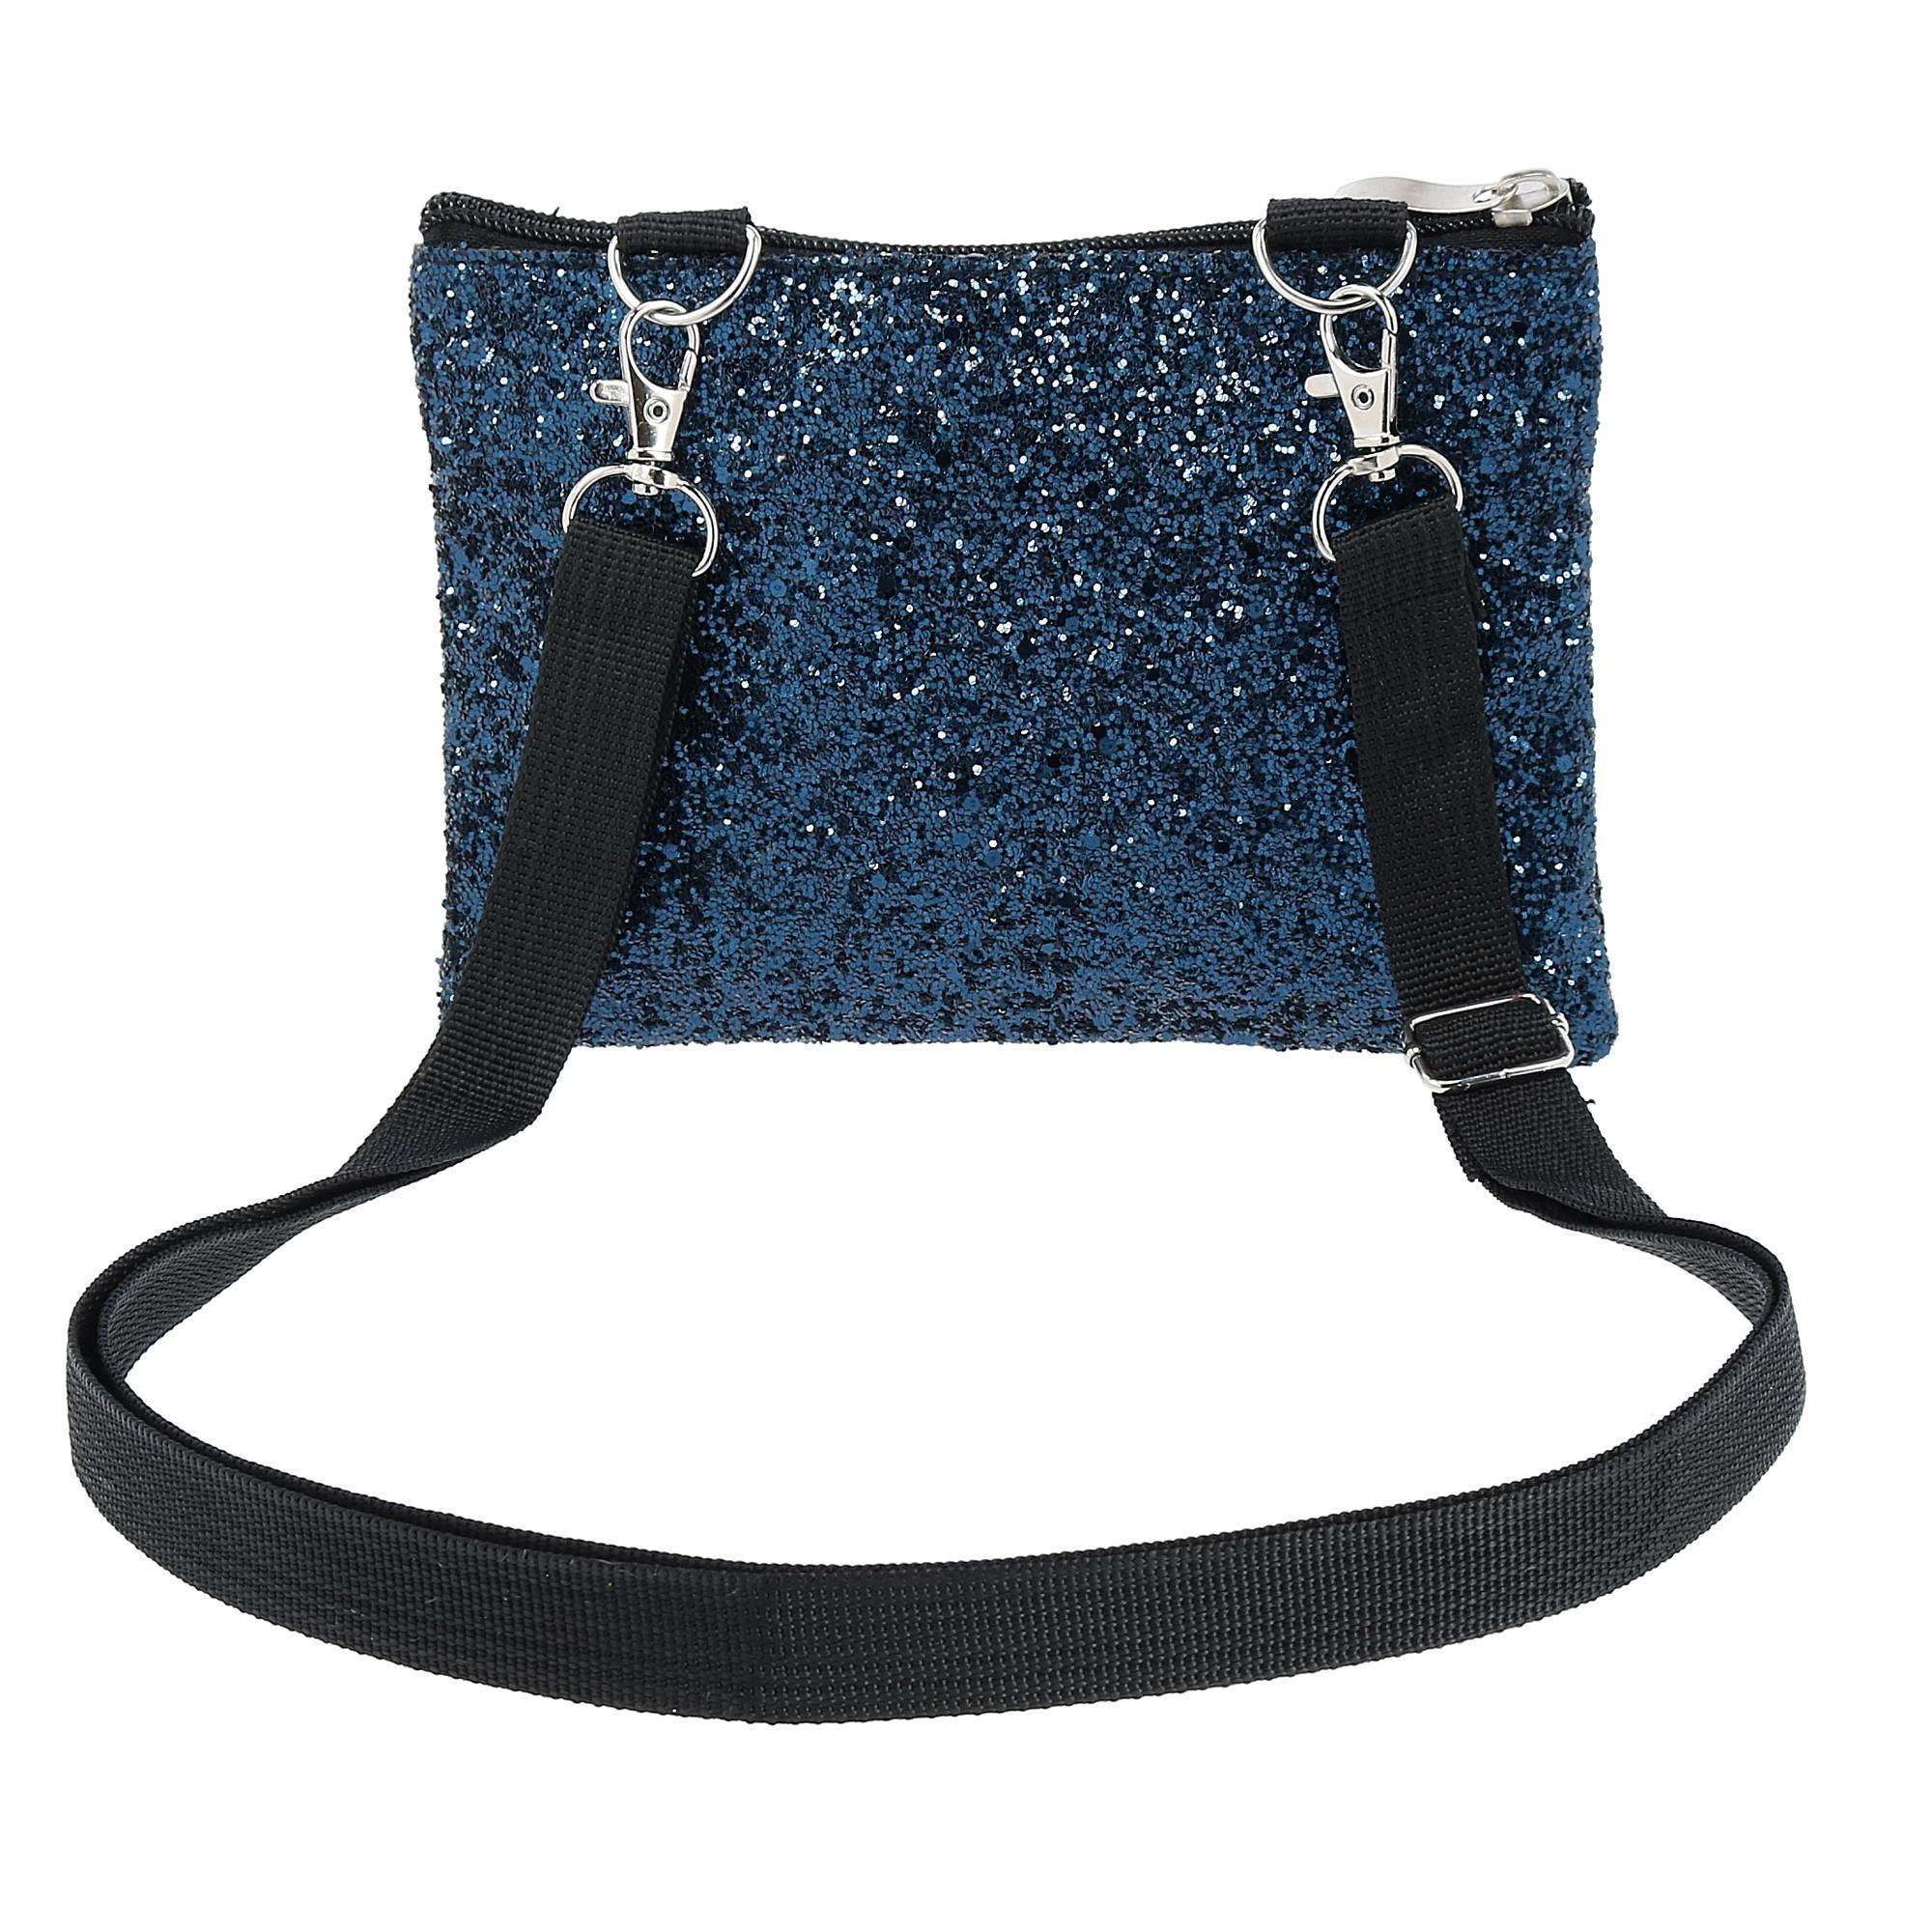 New-2-Moda-Fashion-Glitter-Waist-Pack-Convertible-Cross-Body-Bag thumbnail 7